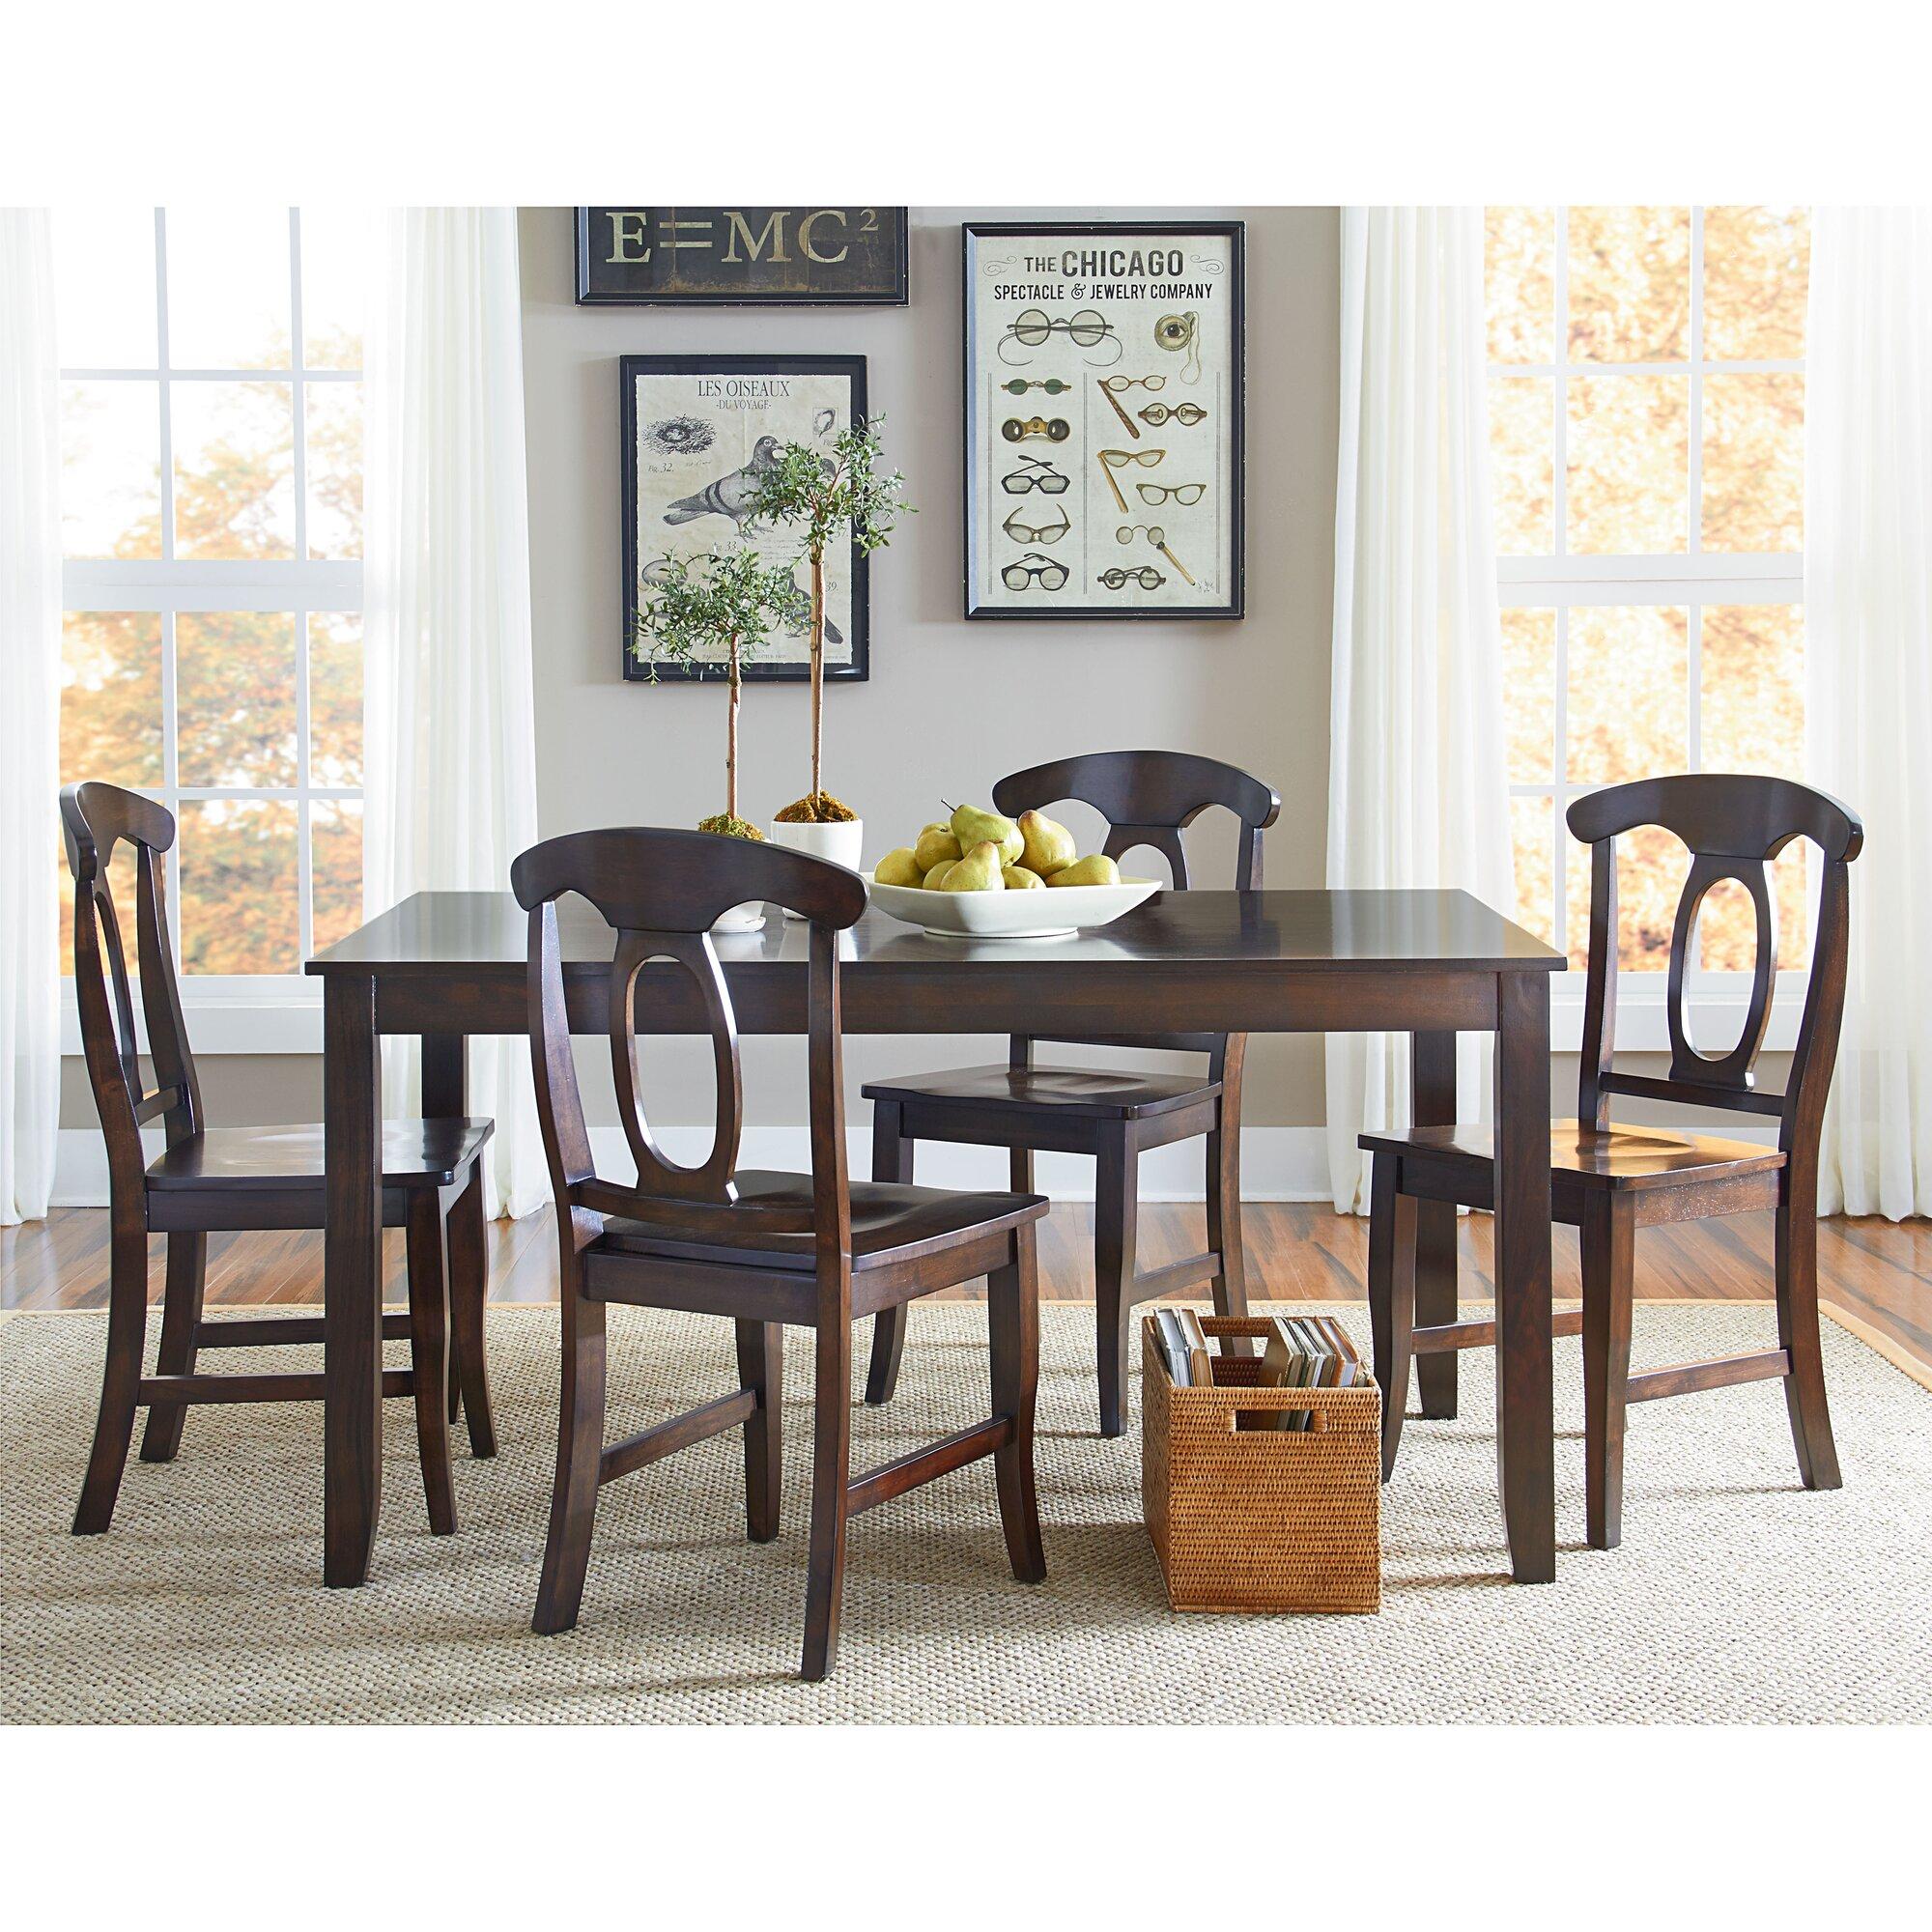 Standard Furniture Larkin 5 Piece Dining Set & Reviews | Wayfair